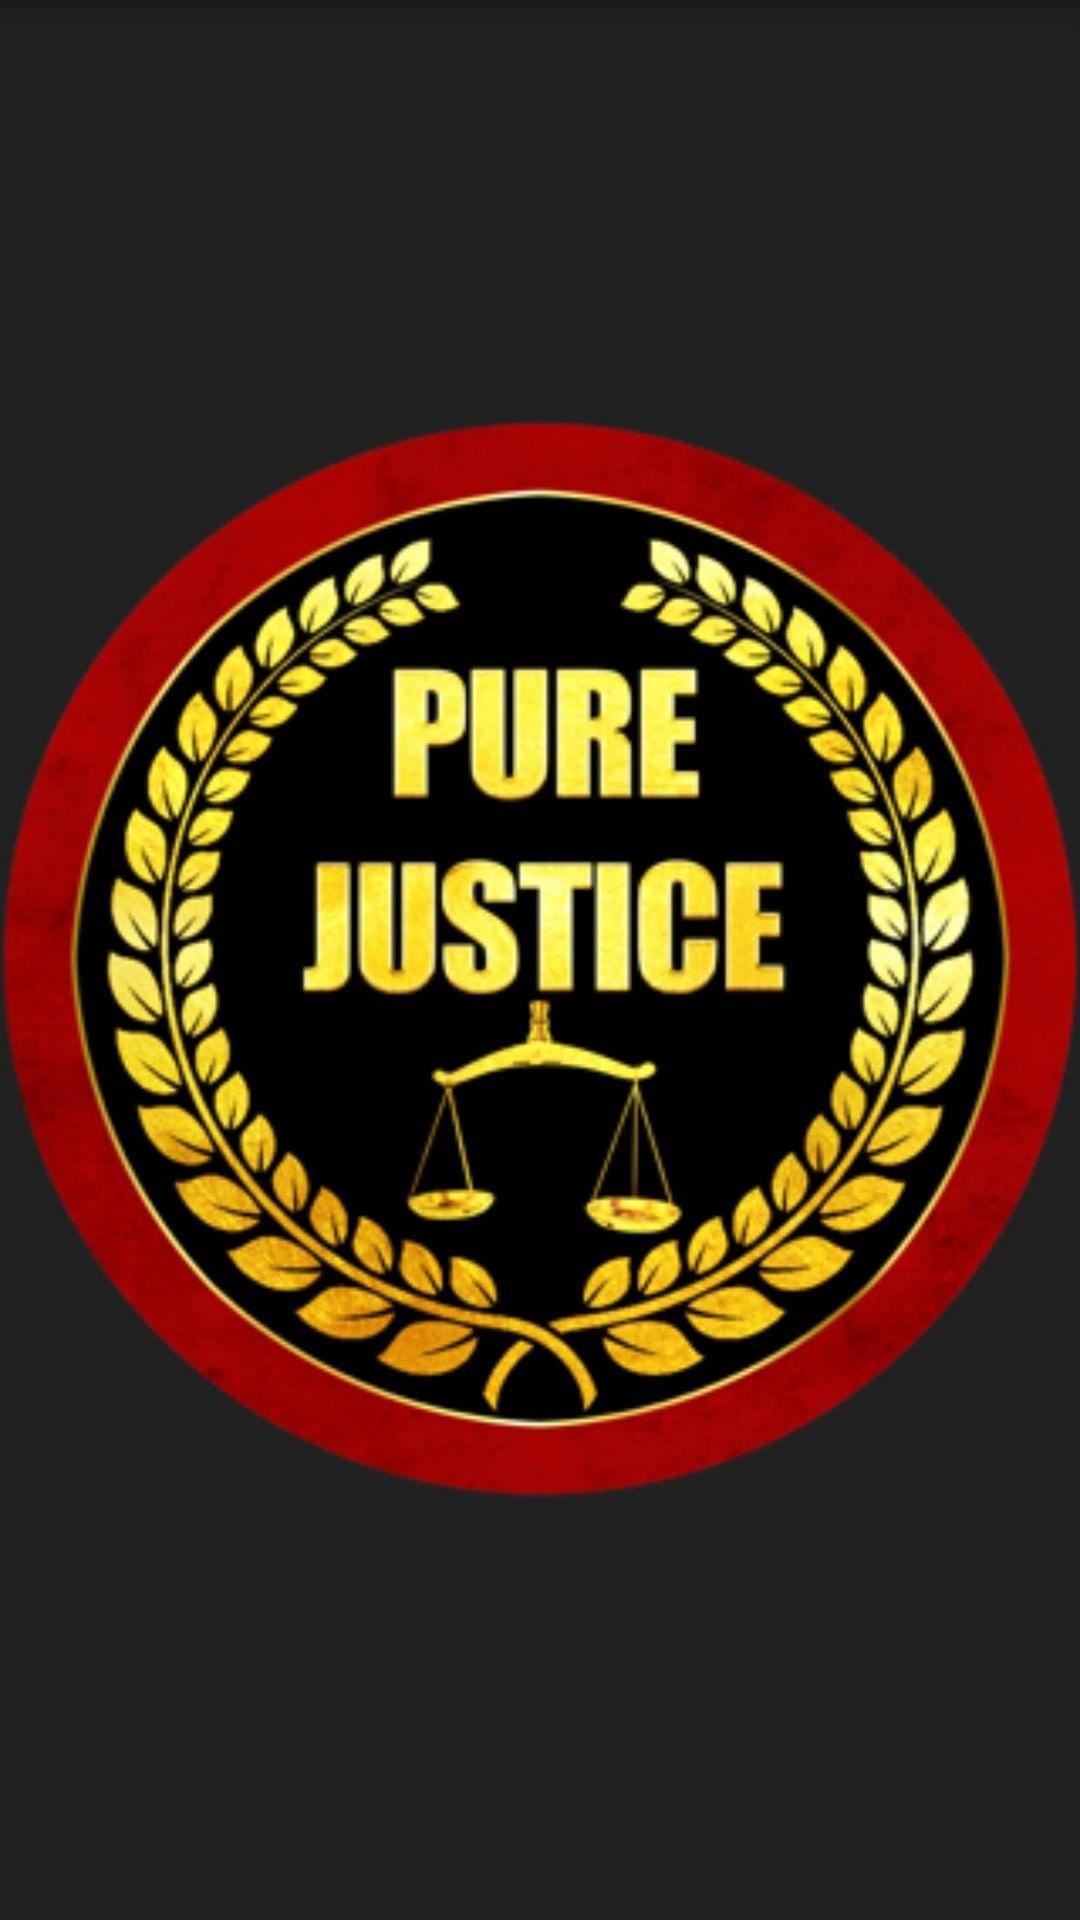 PURE JUSTICE LOGO